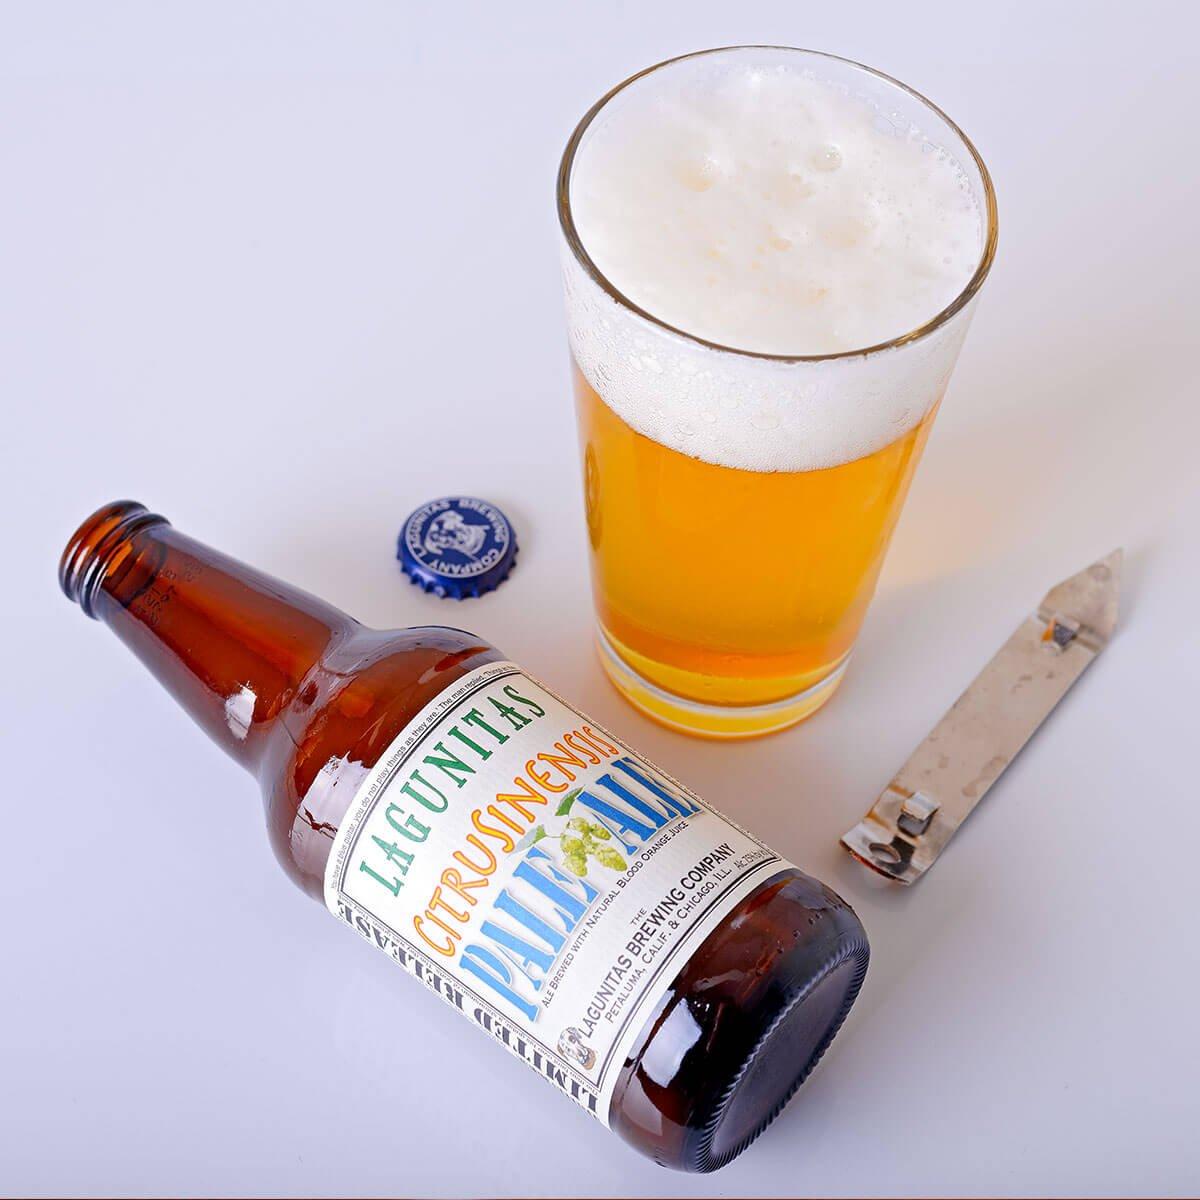 CitruSinensis, an American Pale Ale by Lagunitas Brewing Company